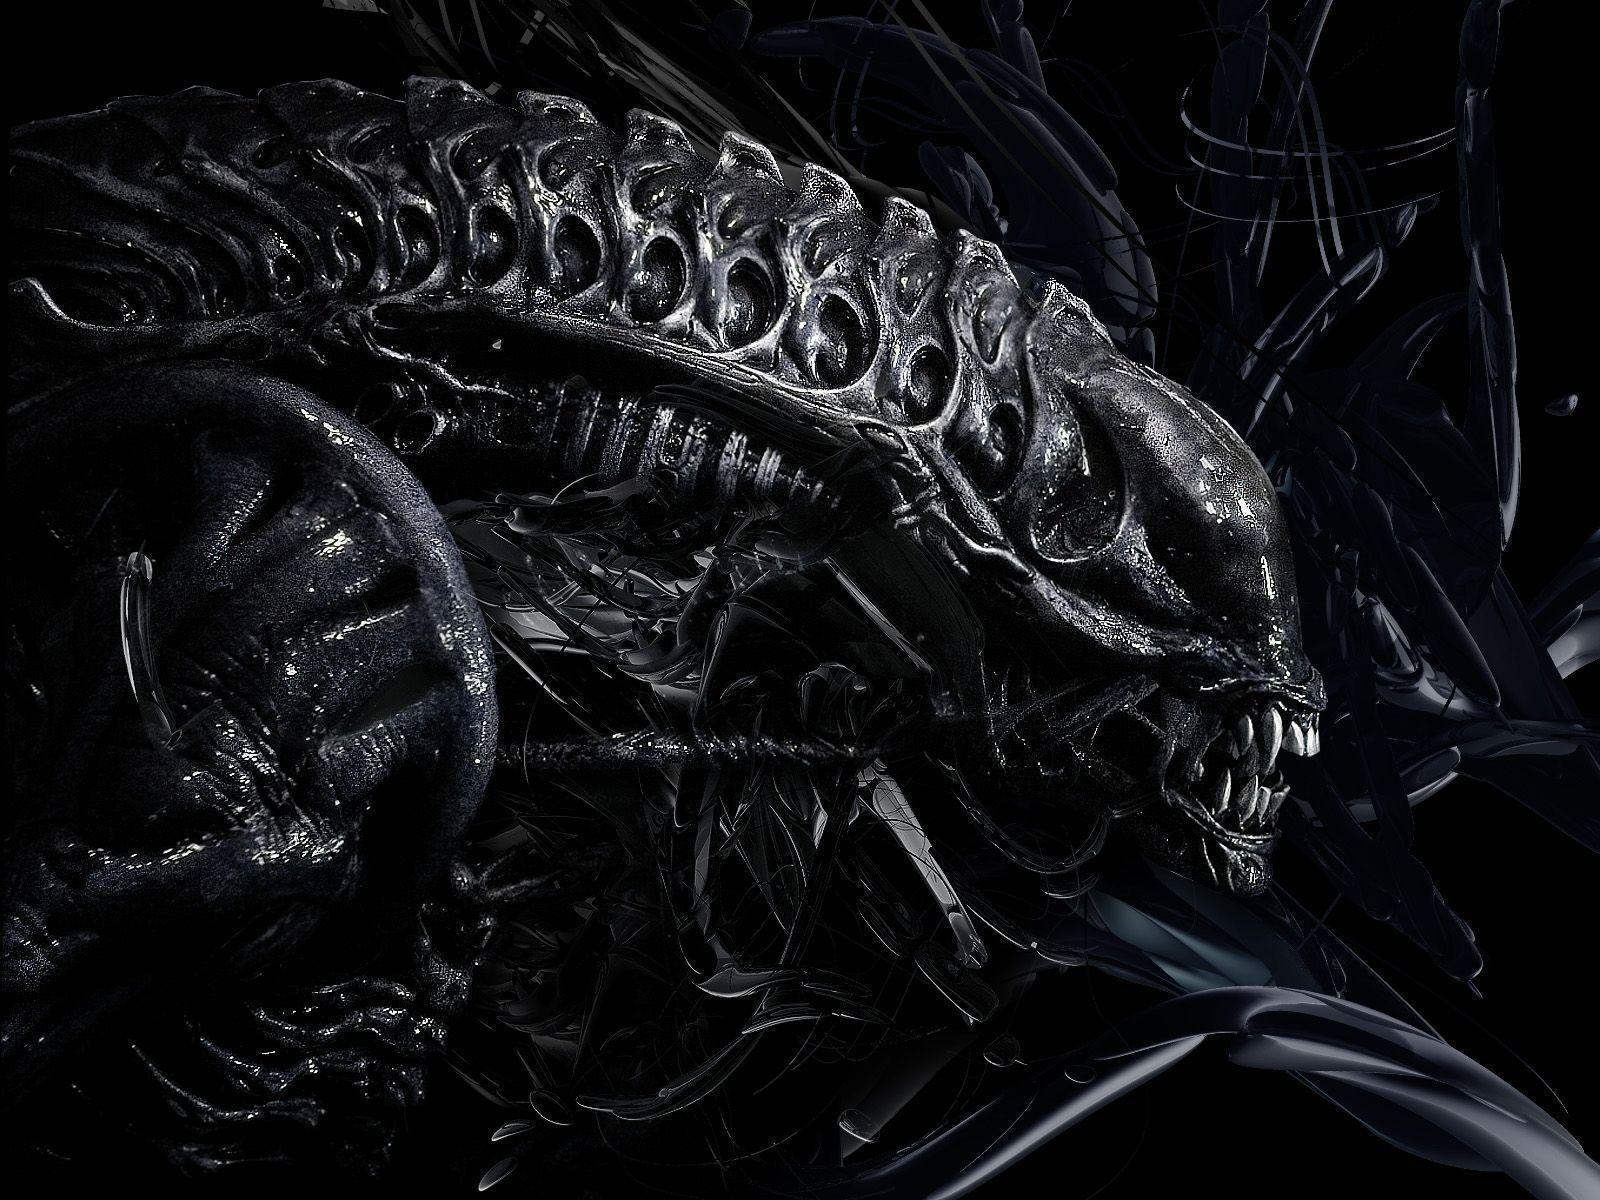 Alien Desktop Wallpaper Hd Alien Wallpapers Wallpaper Cave